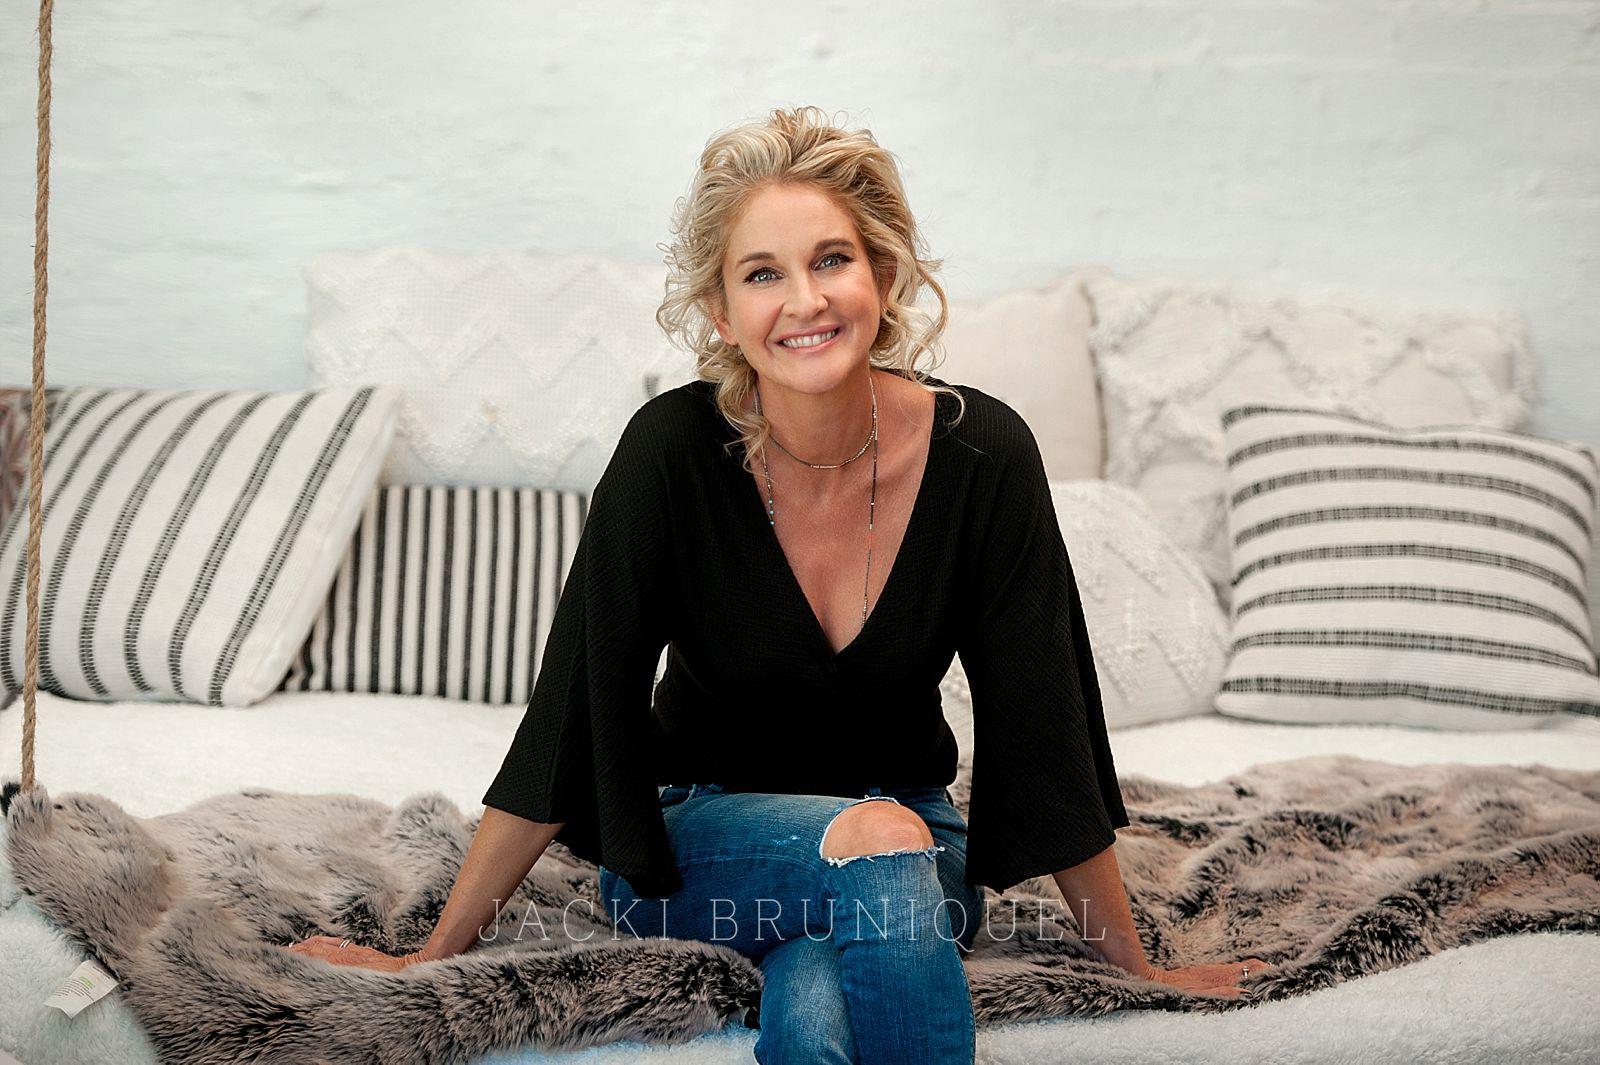 Creative branding shoot  of business women Deborah Goode shot by top South African portrait photographer Jacki Bruniquel.